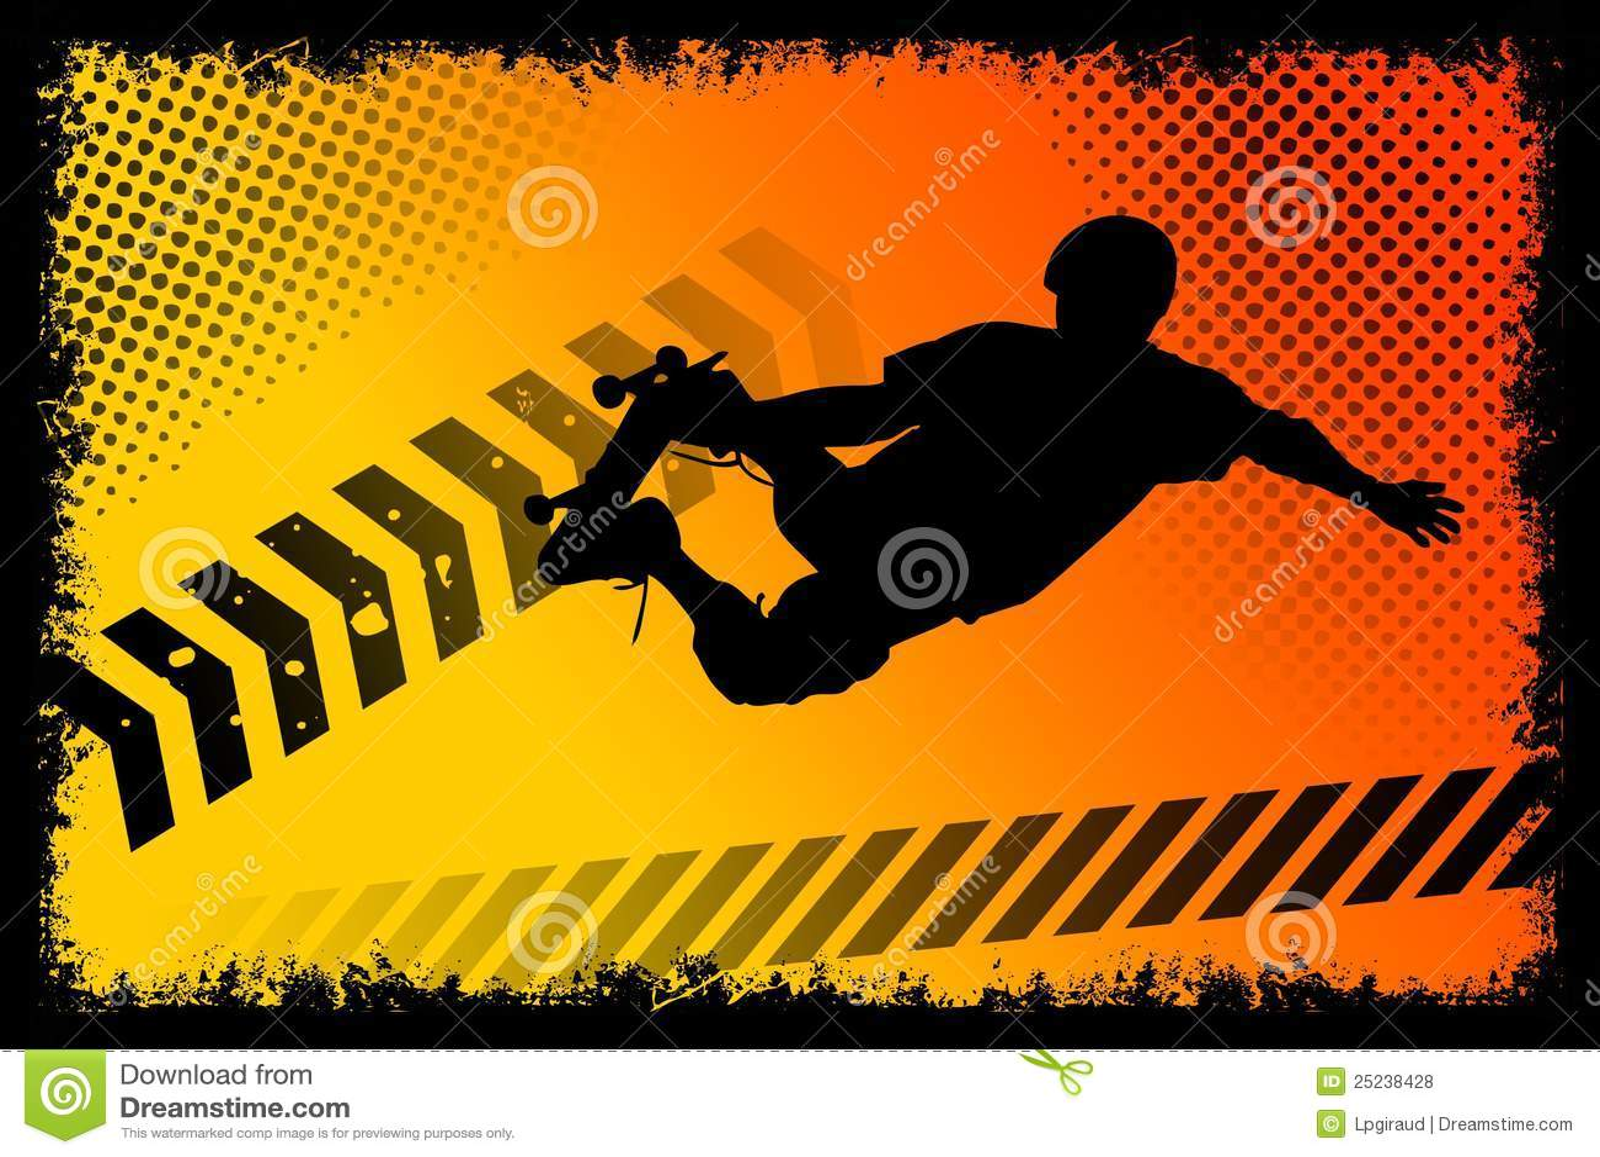 Skateboardplakat